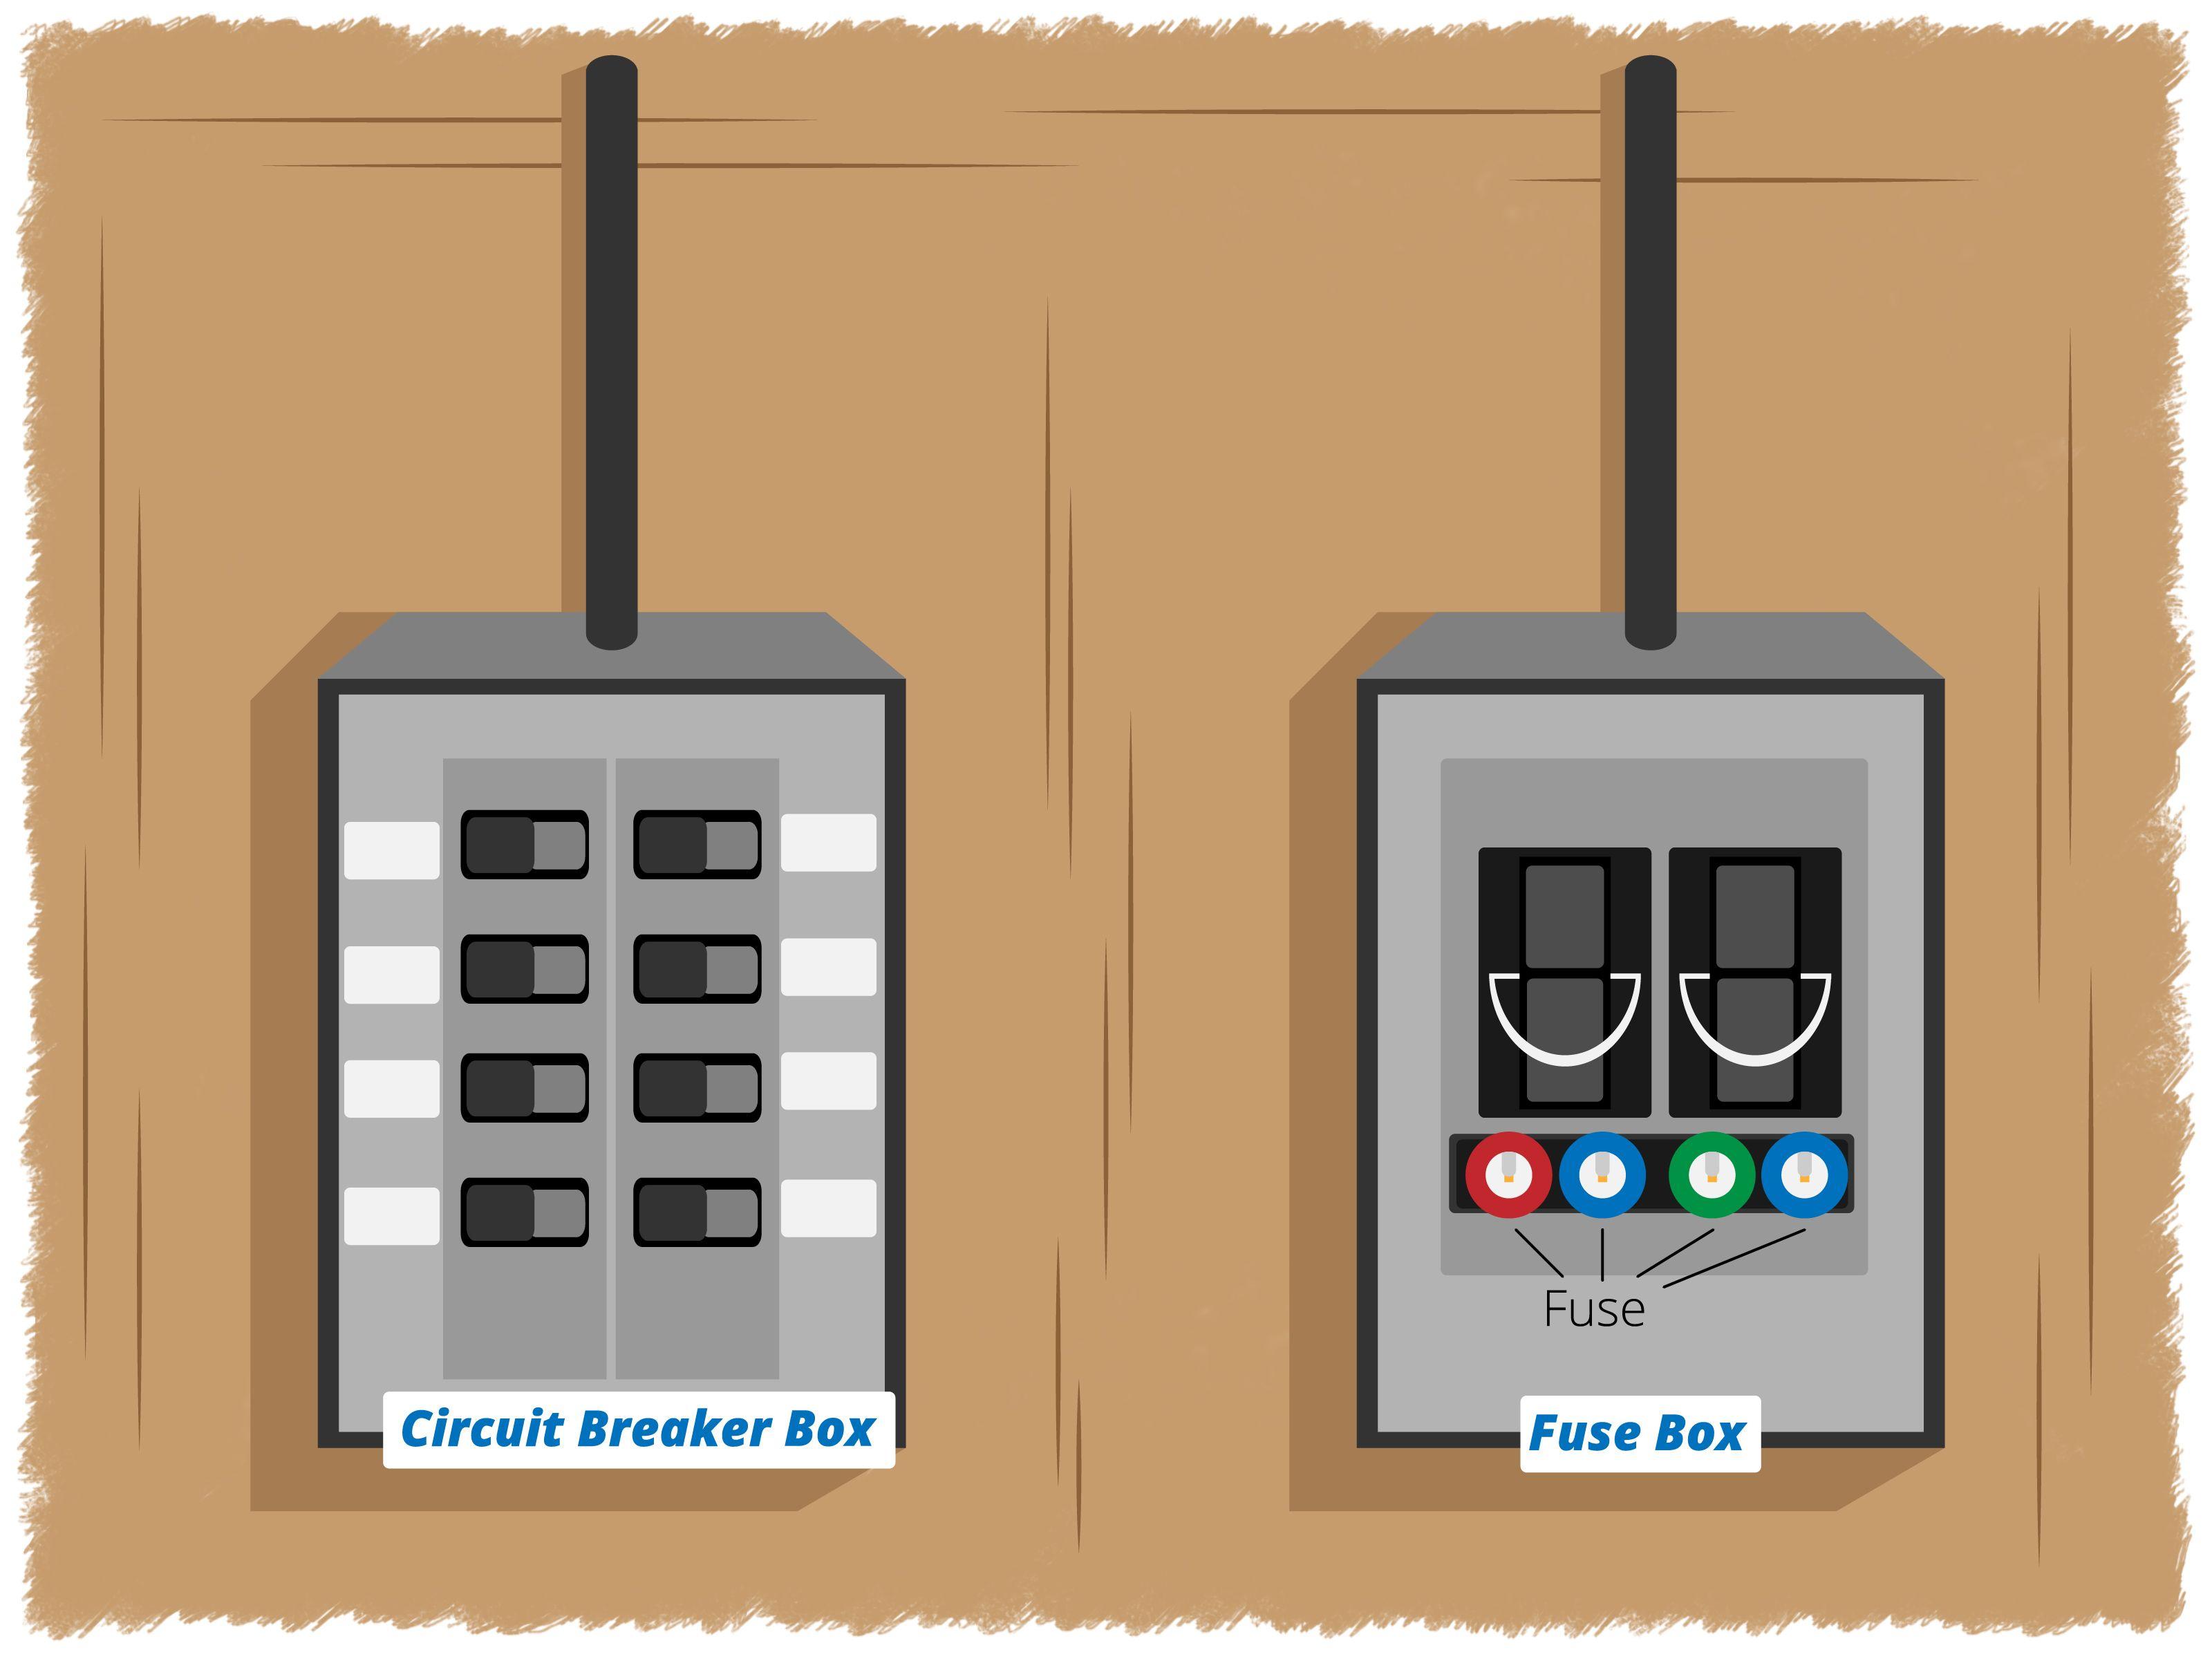 fuse box vs breaker wiring diagram source blown fuse circuit breaker box fuse vs circuit breaker box [ 3200 x 2400 Pixel ]